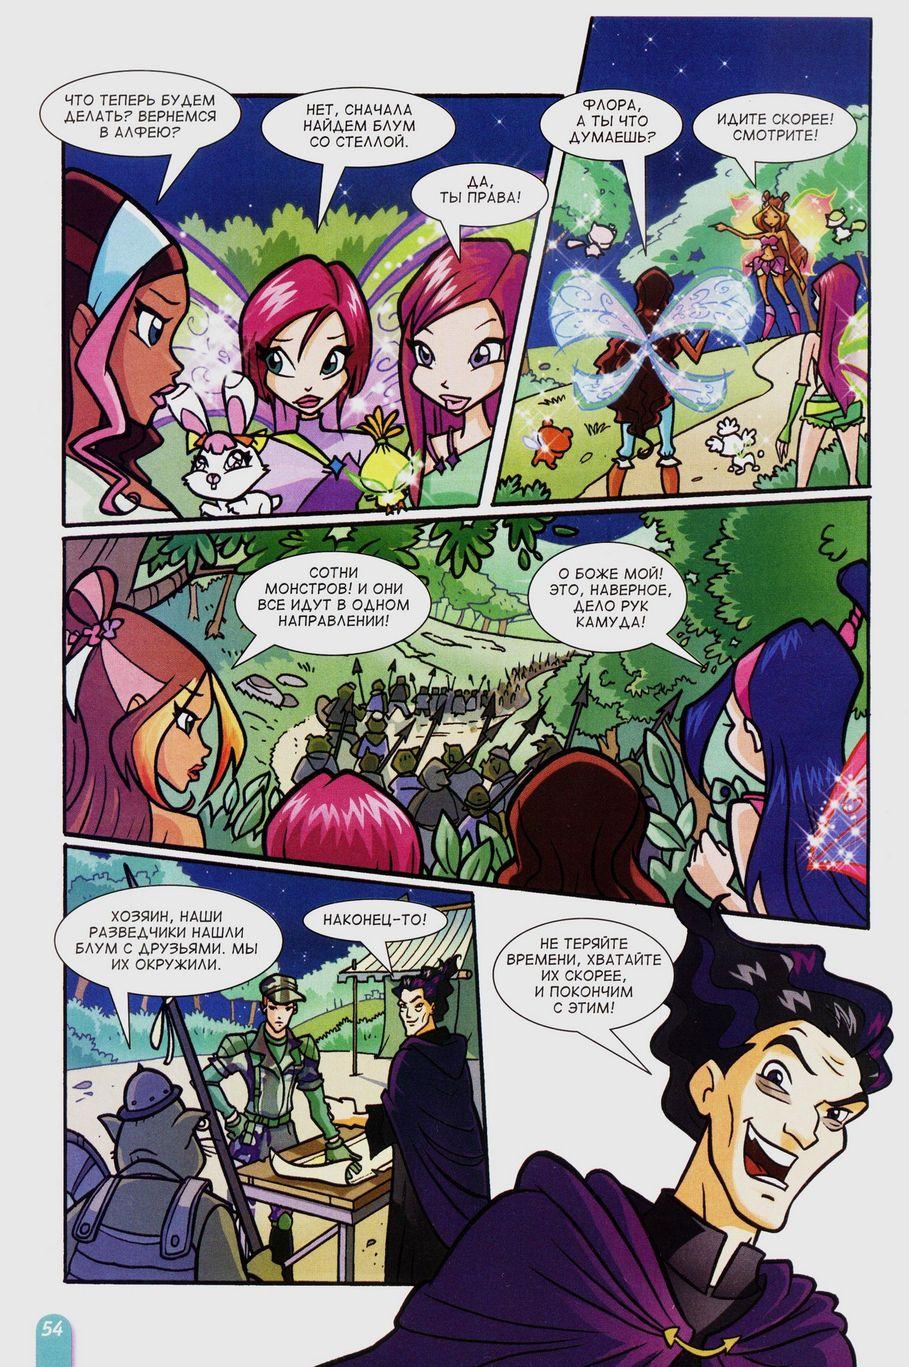 Комикс Винкс Winx - Волшебник Камуд (Журнал Винкс №6 2011) - стр. 54